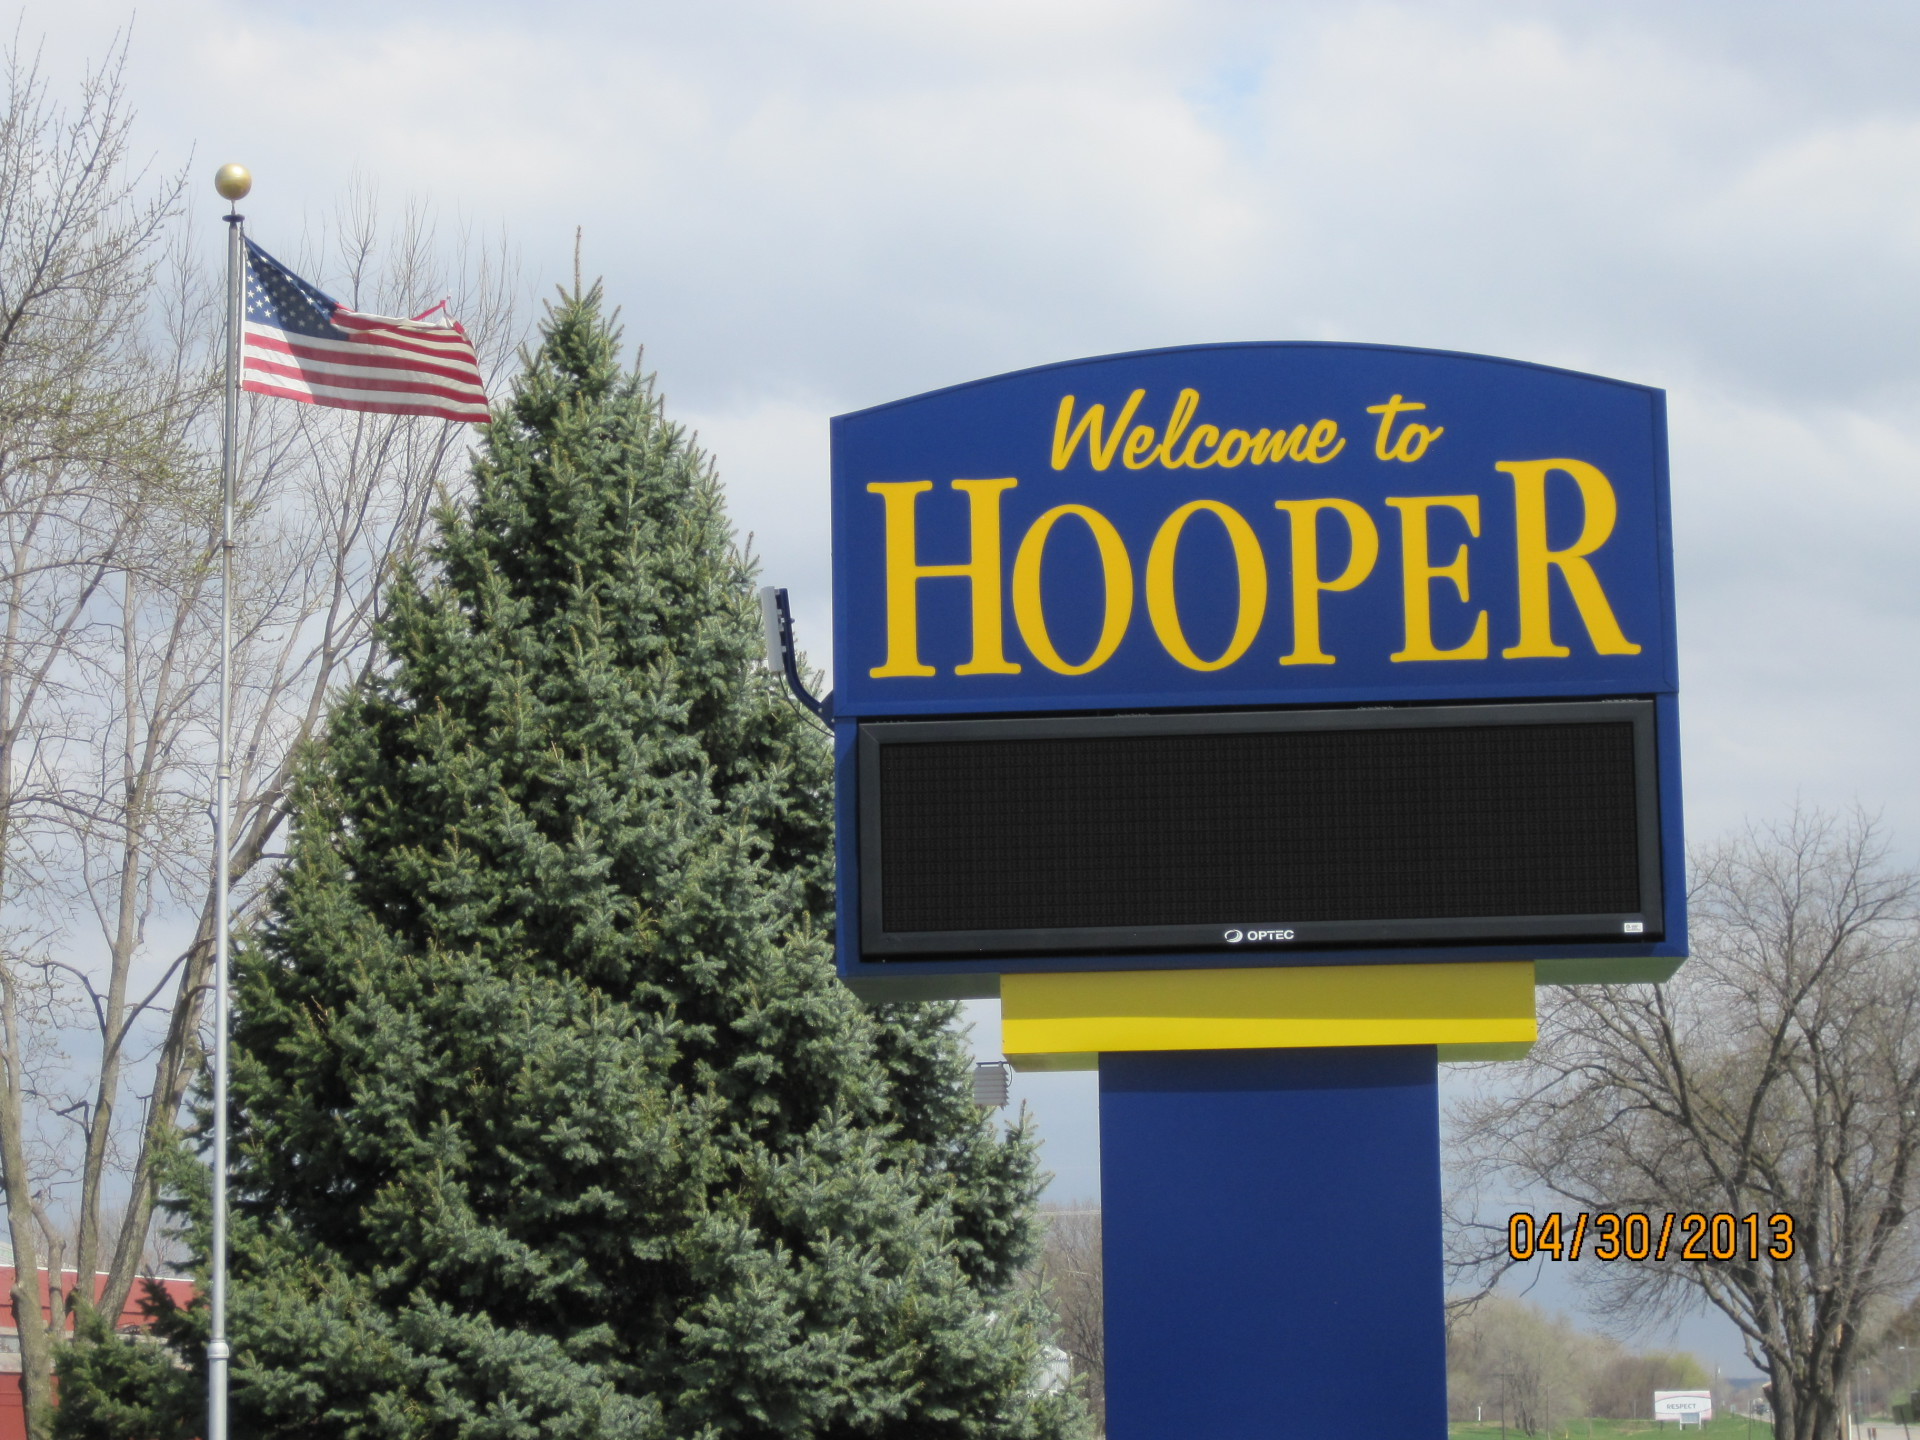 City of Hooper  124 N Main St,   Box C,  Hooper, NE 68031-0597